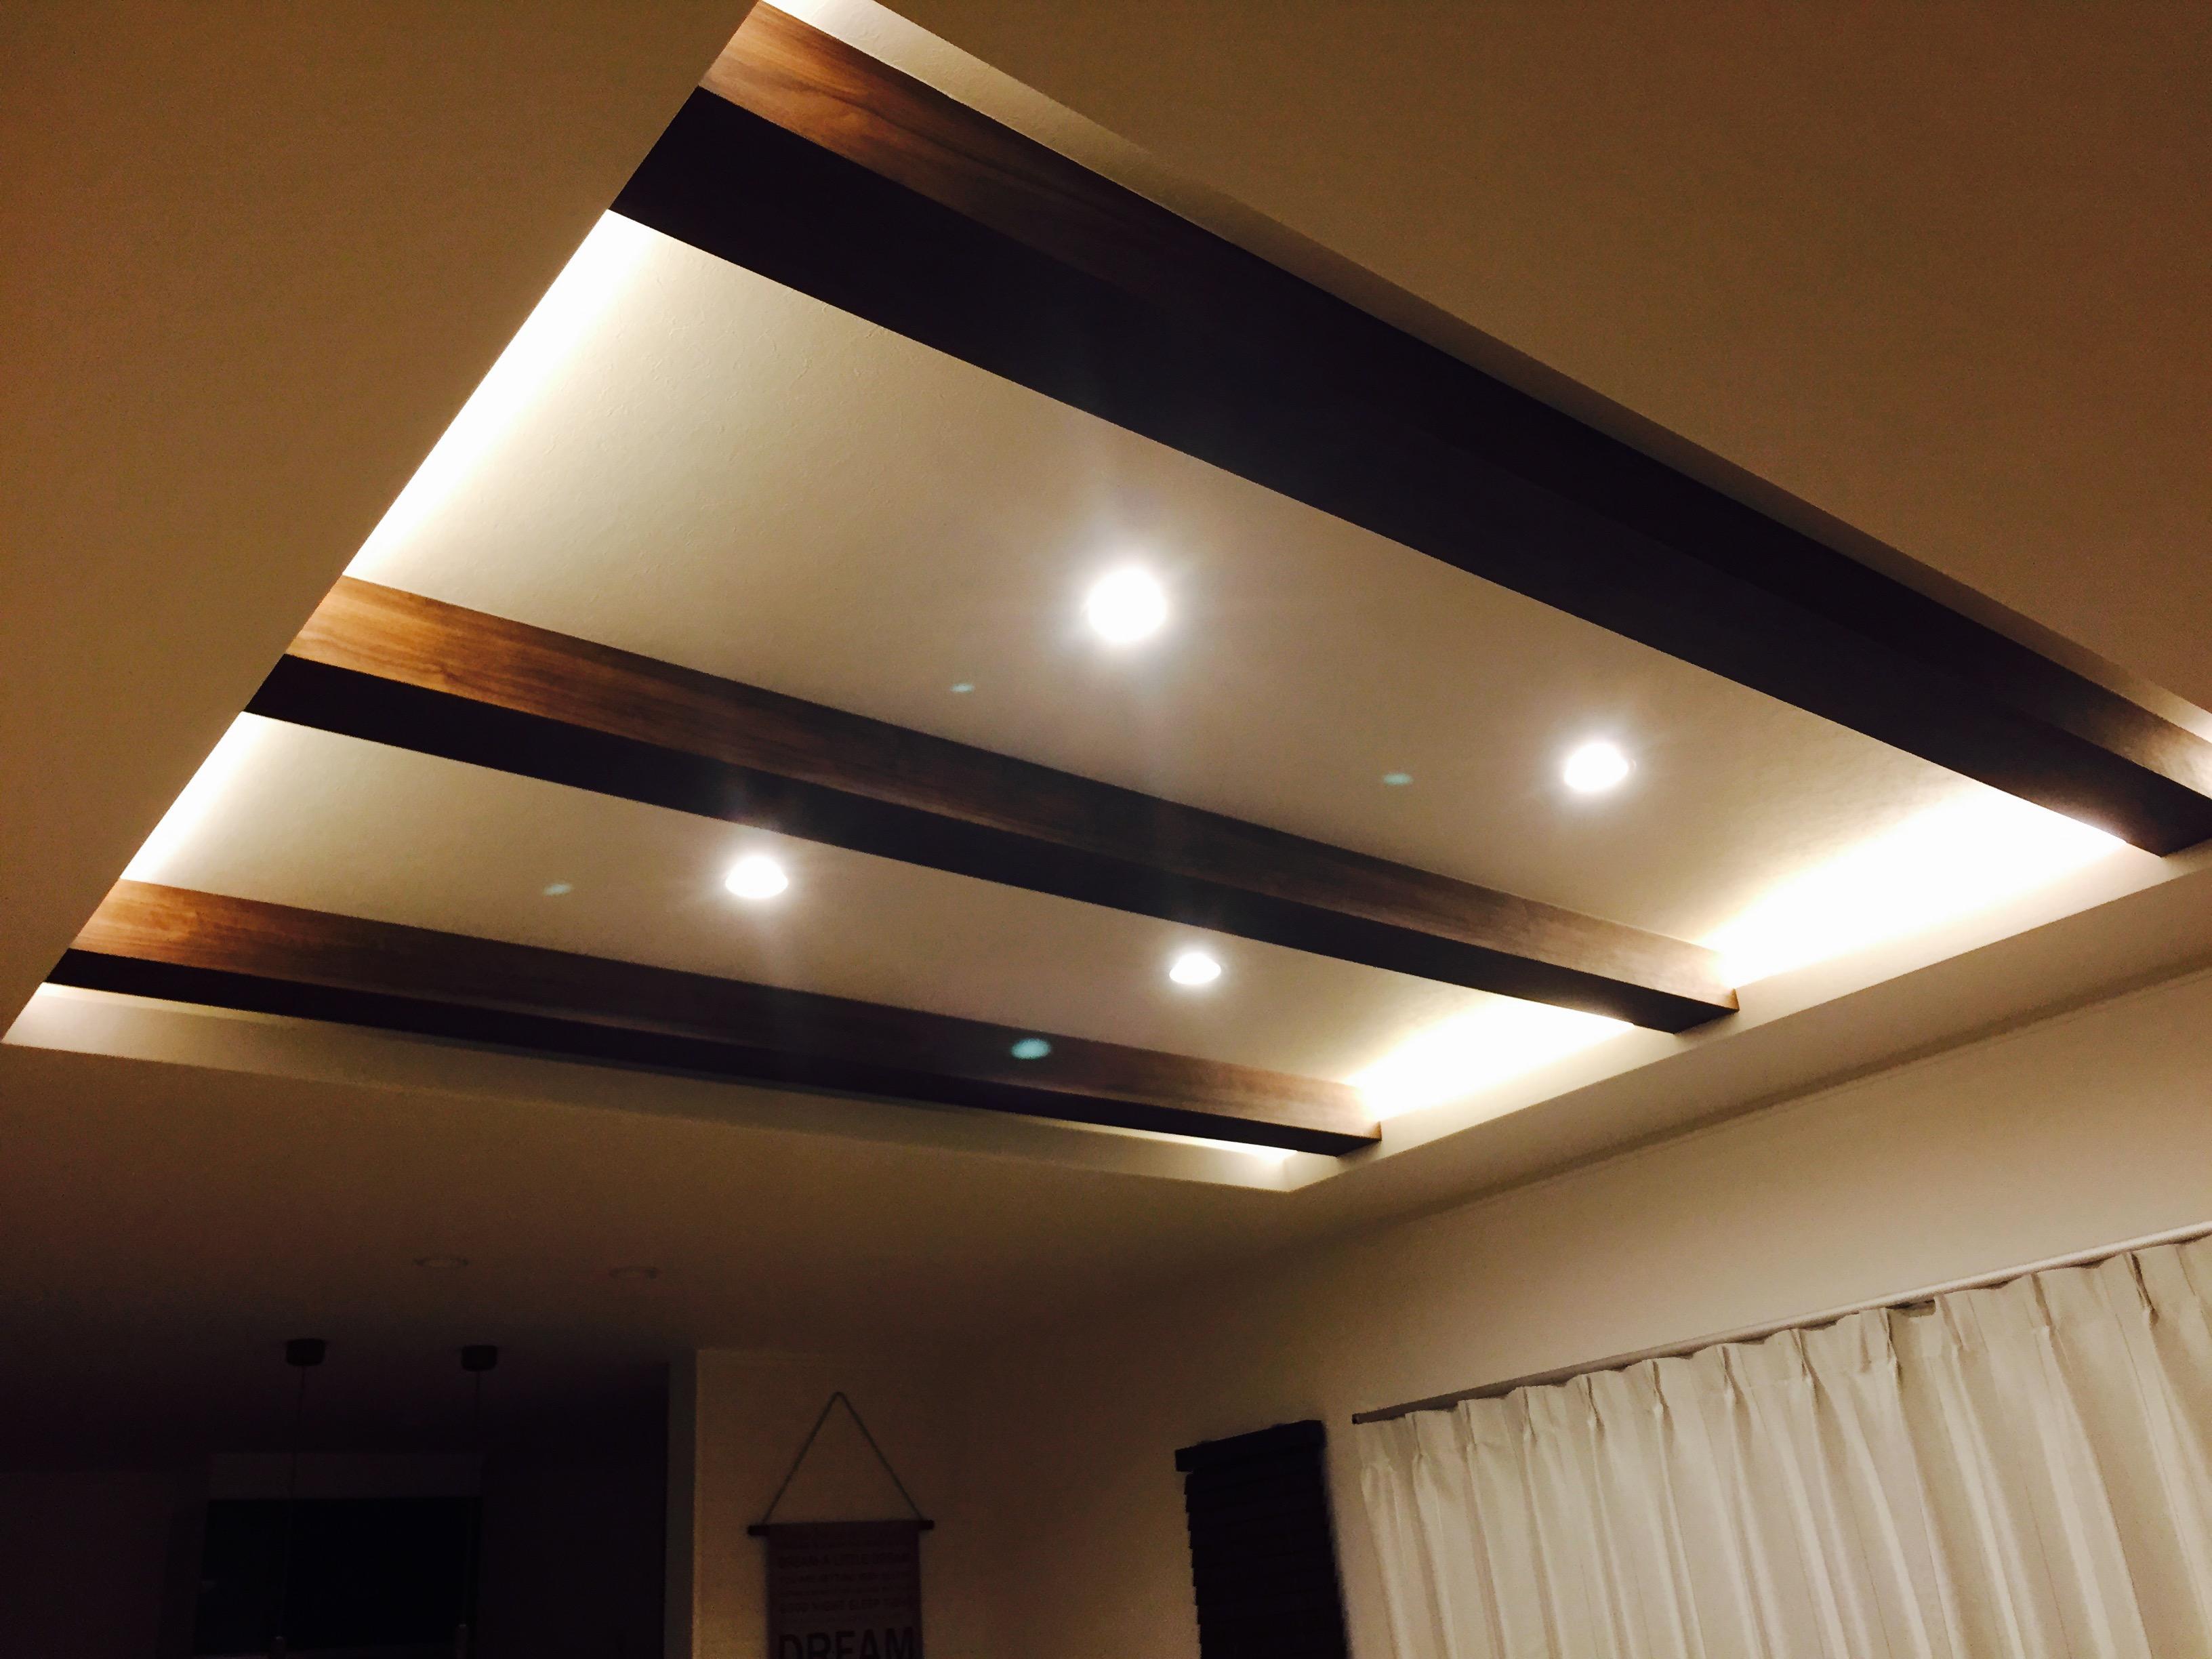 WEB内覧会:リビング~折り上げ天井×見せ梁×間接照明がたまらん!折り上げ天井×見せ梁×間接照明=おしゃれ間接照明は見せ梁に対して垂直方向に付けましたまとめ